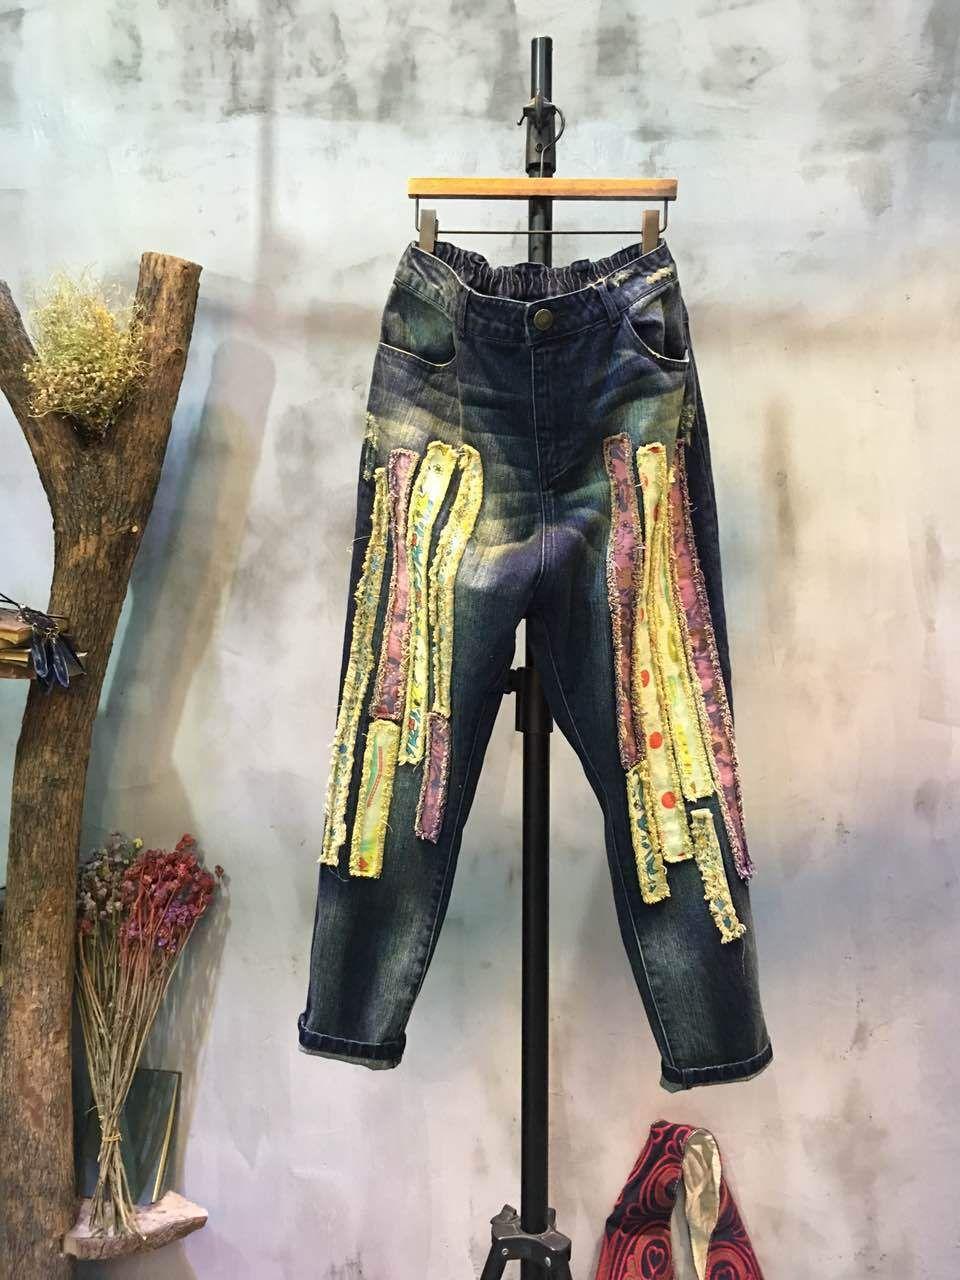 83144756a6c Fashion Cloth Patchwork Fashion Jeans Womans Baggy Jeans  jeans  patchwork   baggy  fashion  Korean  denim  pants  trousers  cool  street  wholesale